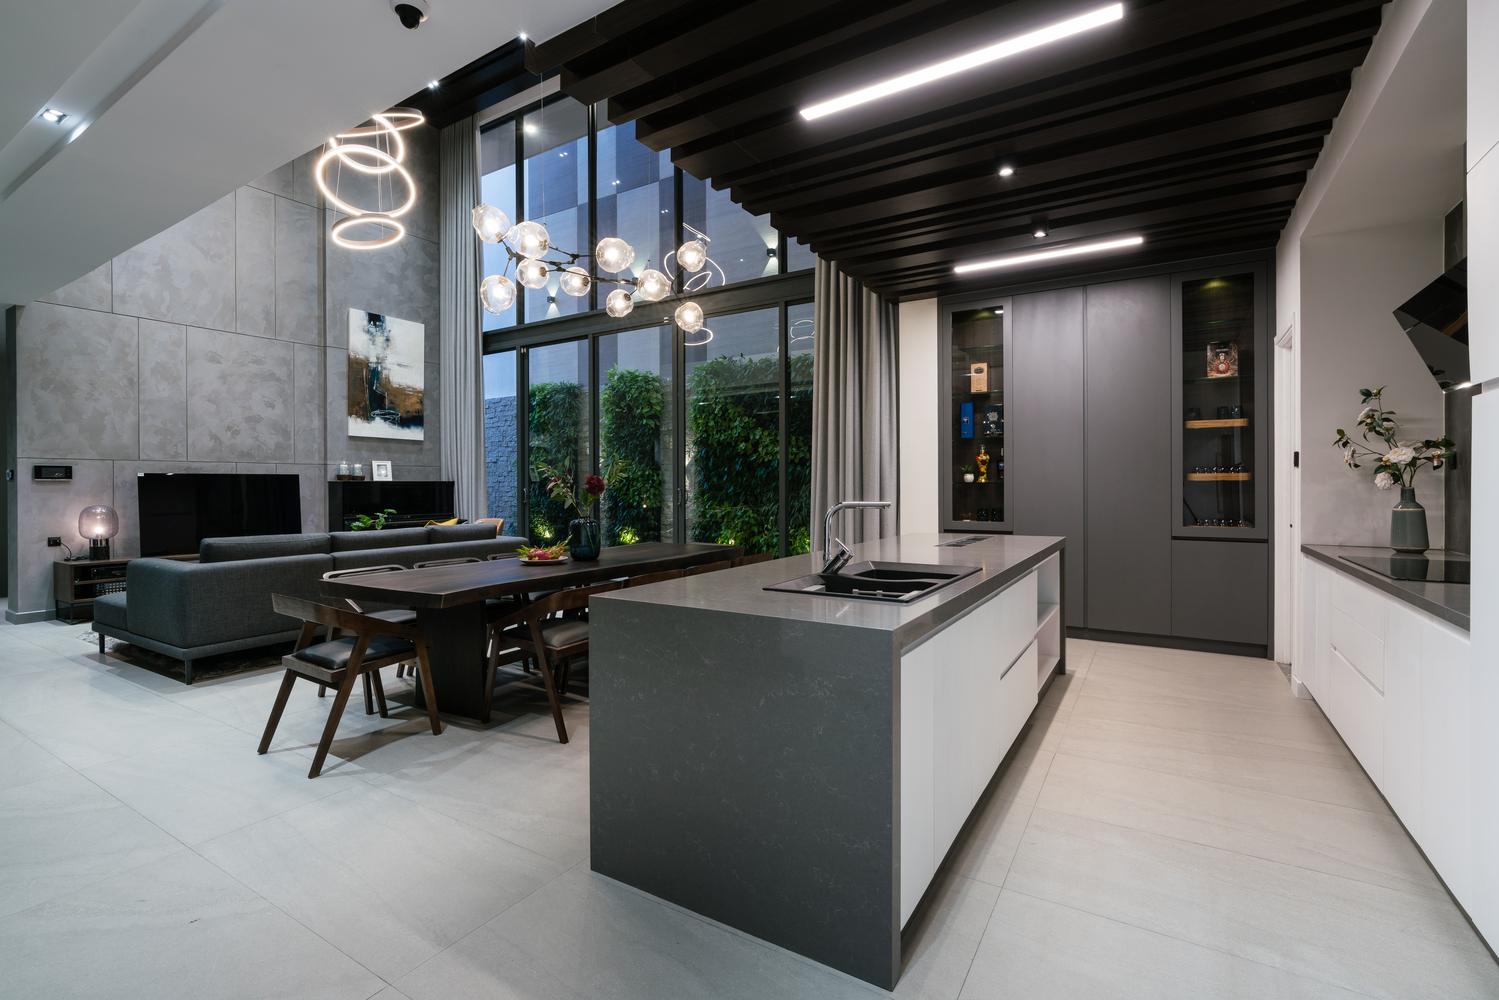 Gallery of The Rough House / NELO DÉCOR - 26